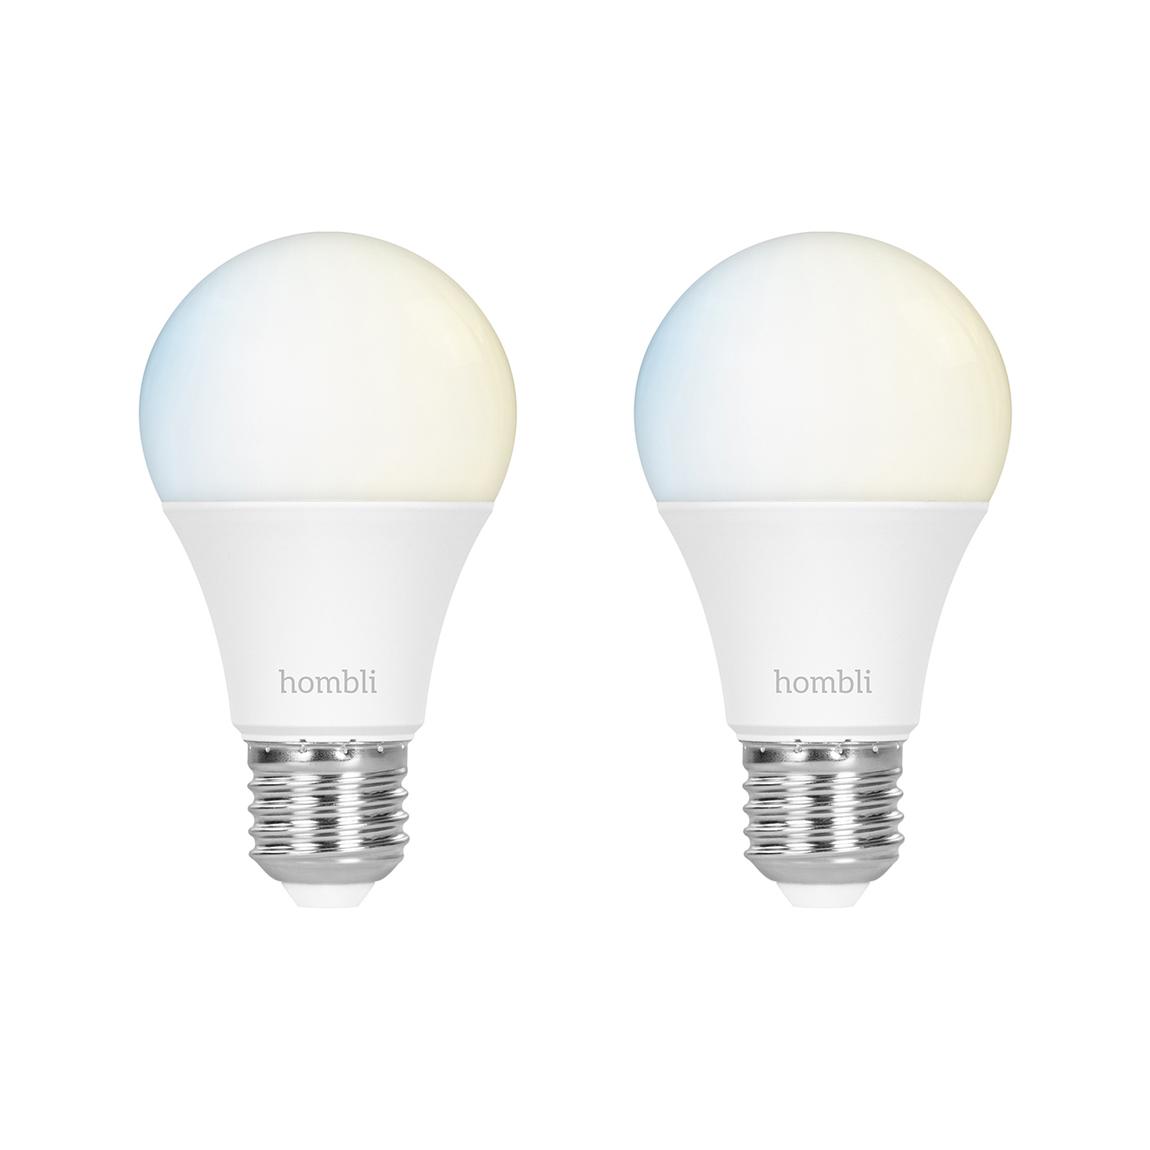 Hombli Smart Bulb E27 White-Lampe 2er-Set